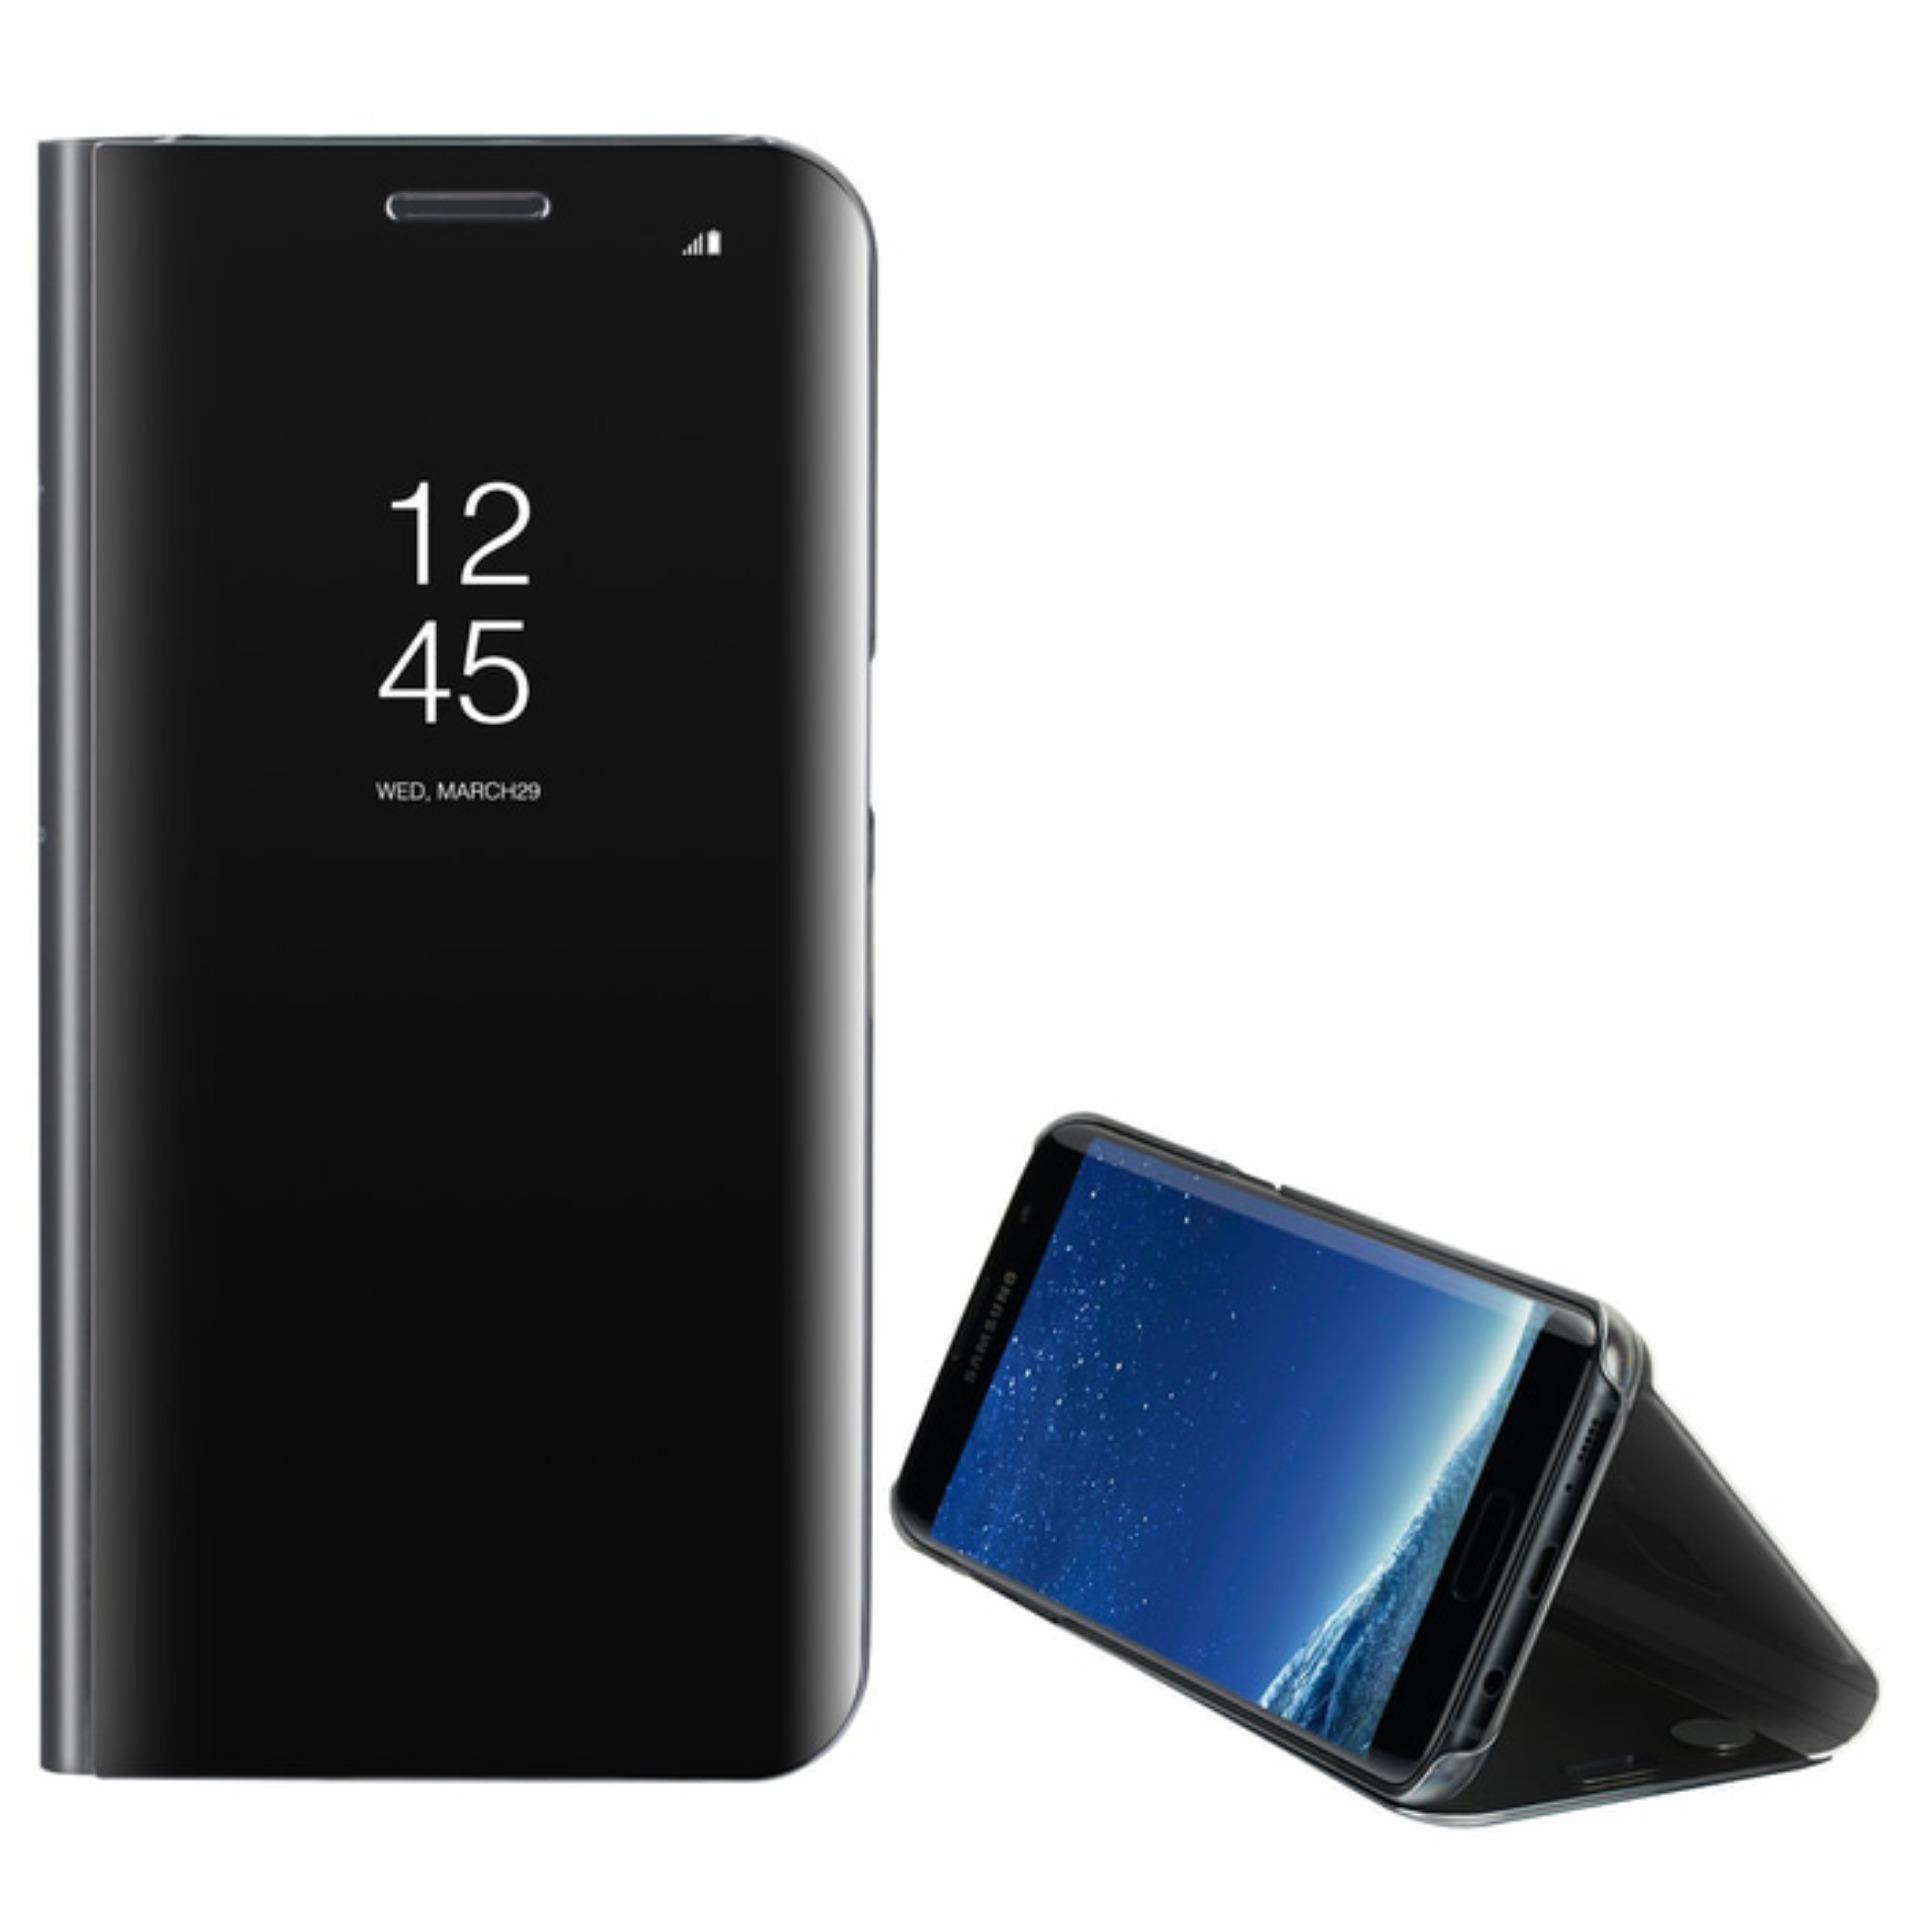 Cek Harga Baru Ume Flip Cover Samsung Galaxy J5 Prime Biru Muda Mercury Jelly Case Clear Premium View Flipcover